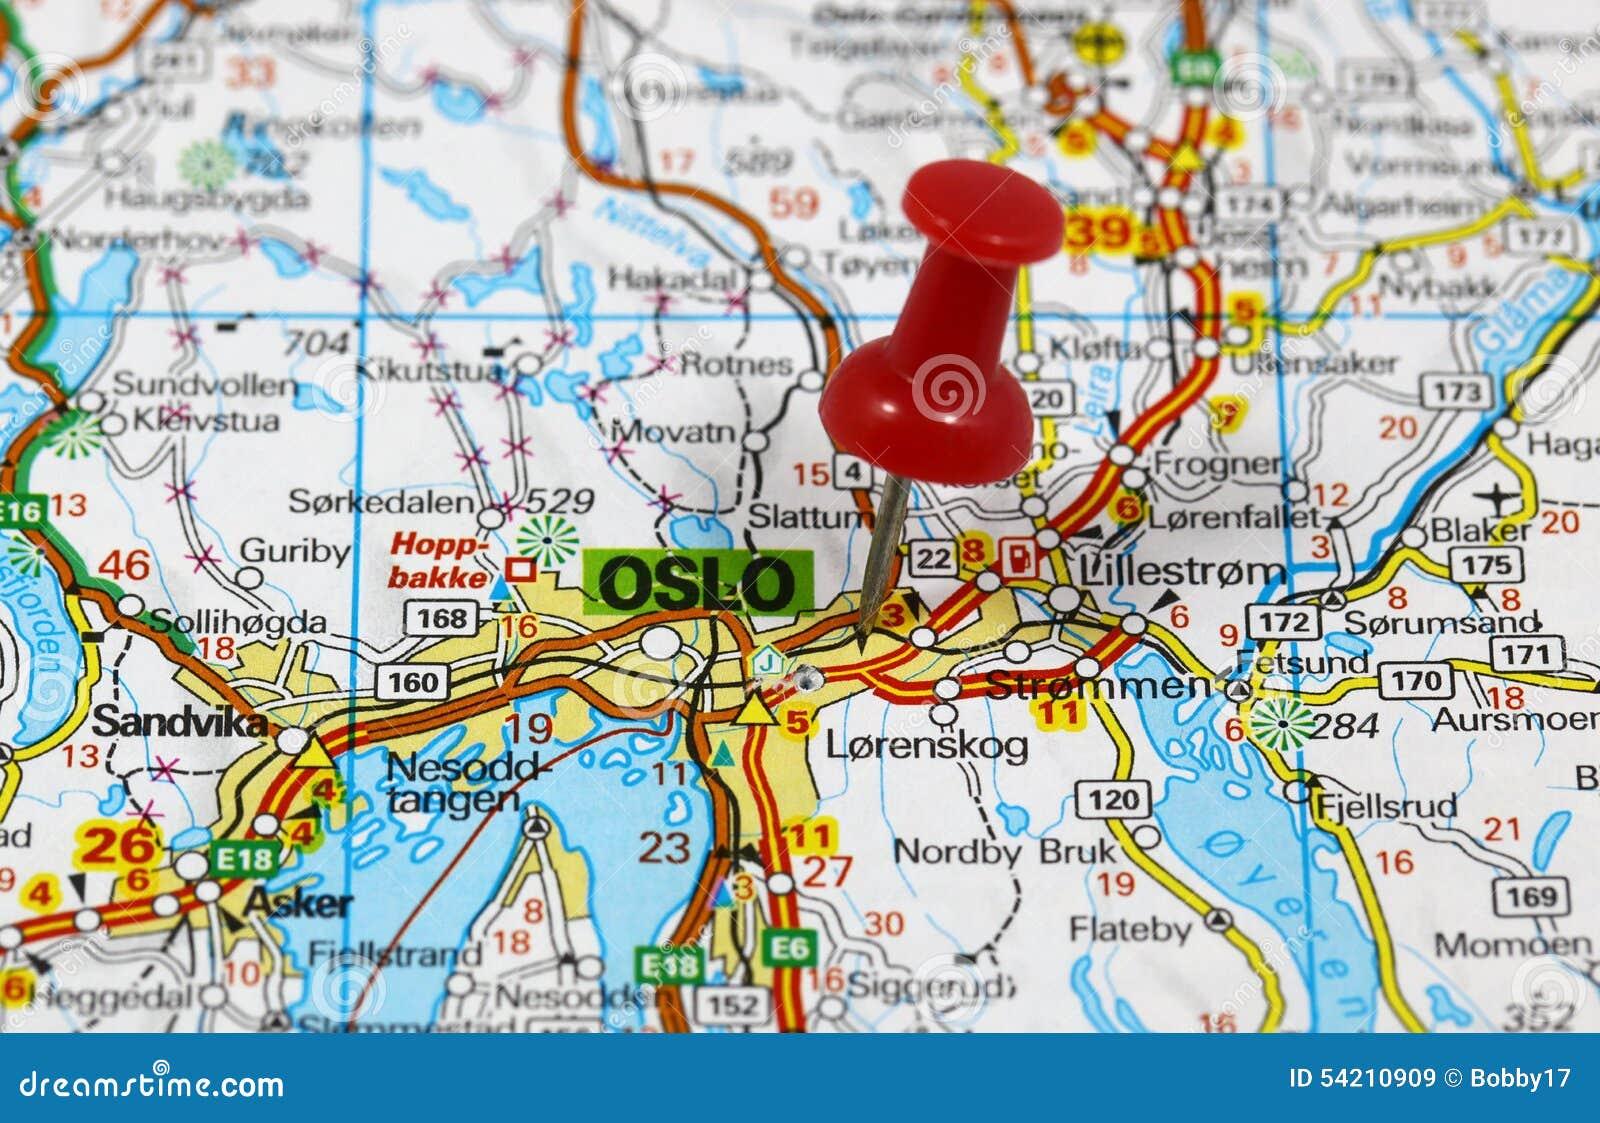 Oslo Stock Photo Image 54210909